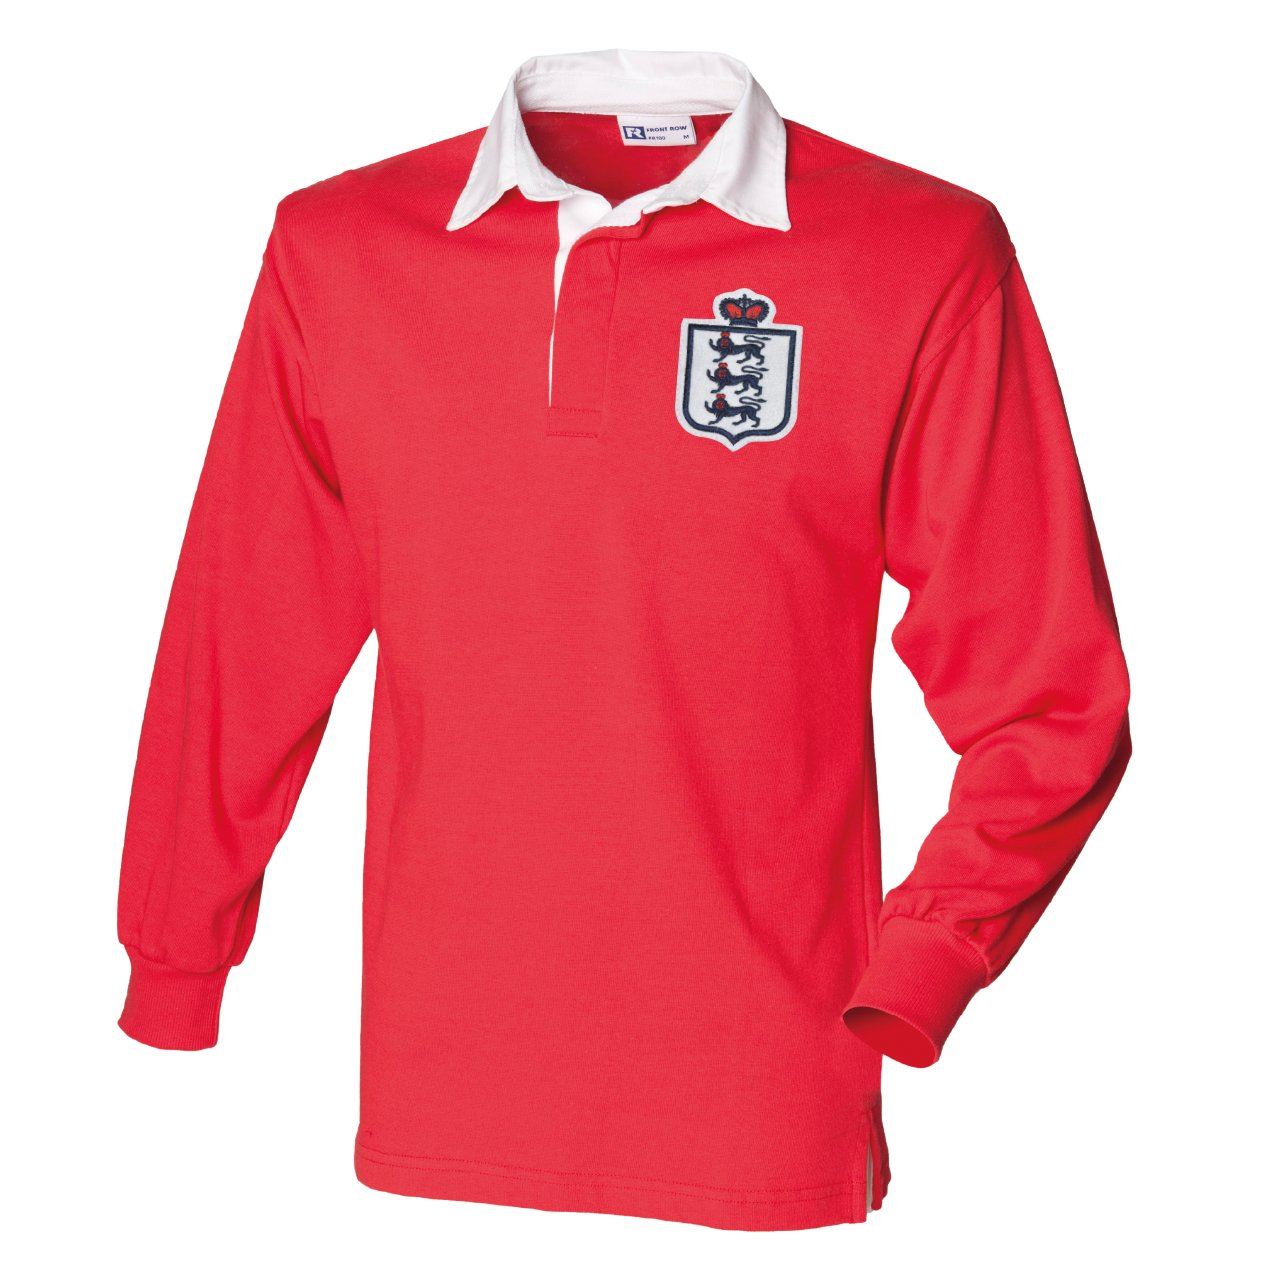 Men's Retro England Football Long Sleeved Rugby Shirt